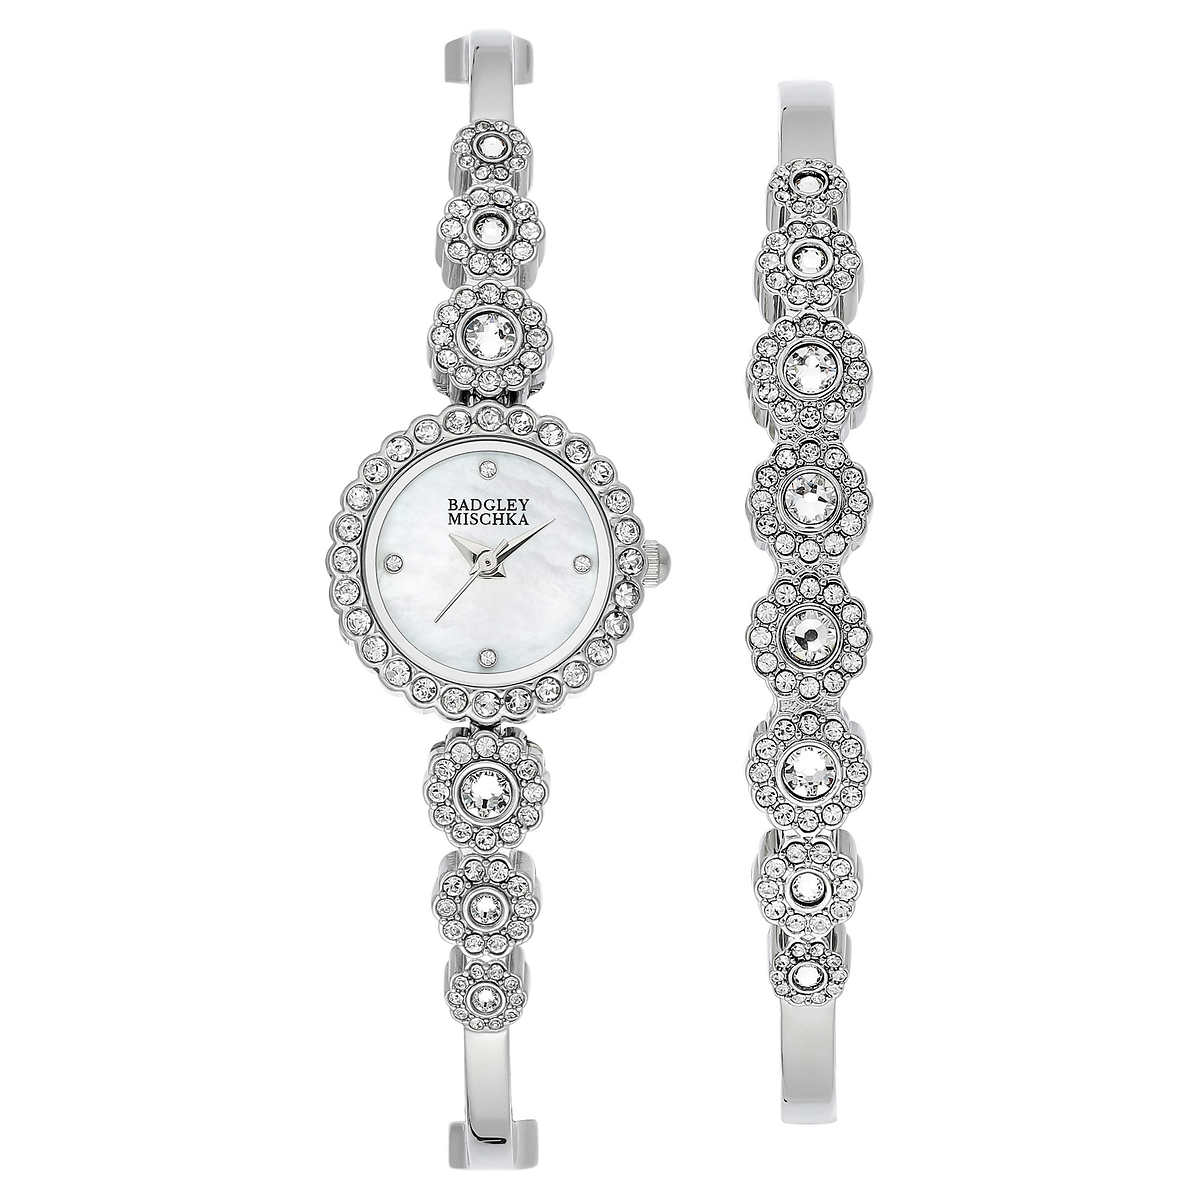 7ee1db6c2 Badgley Mischka Silver-Tone Swarovski Crystal Ladies Watch